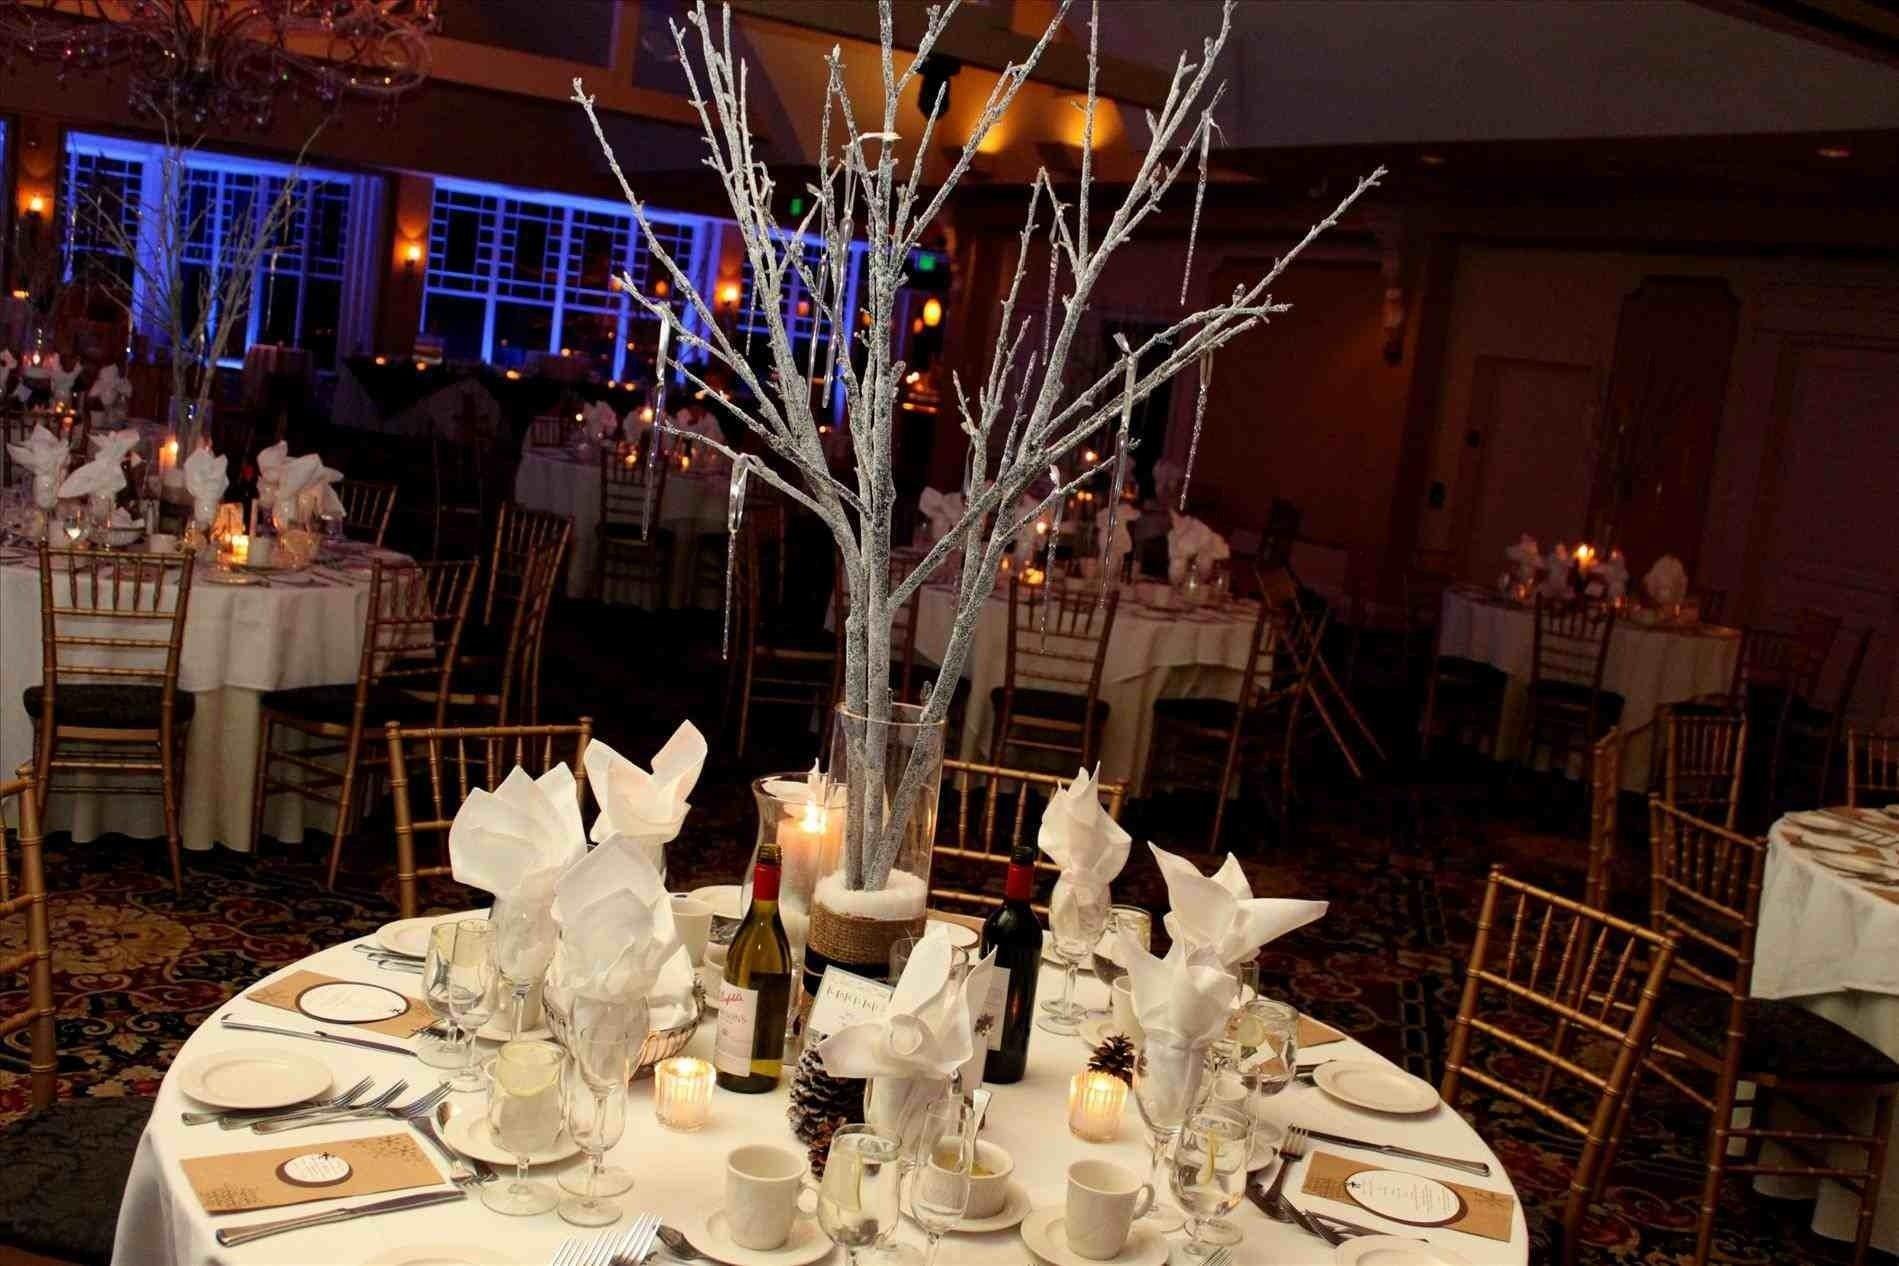 10 Gorgeous Cheap Wedding Ideas For Winter incredible winter wedding ideas on a budget image for cheap backyard